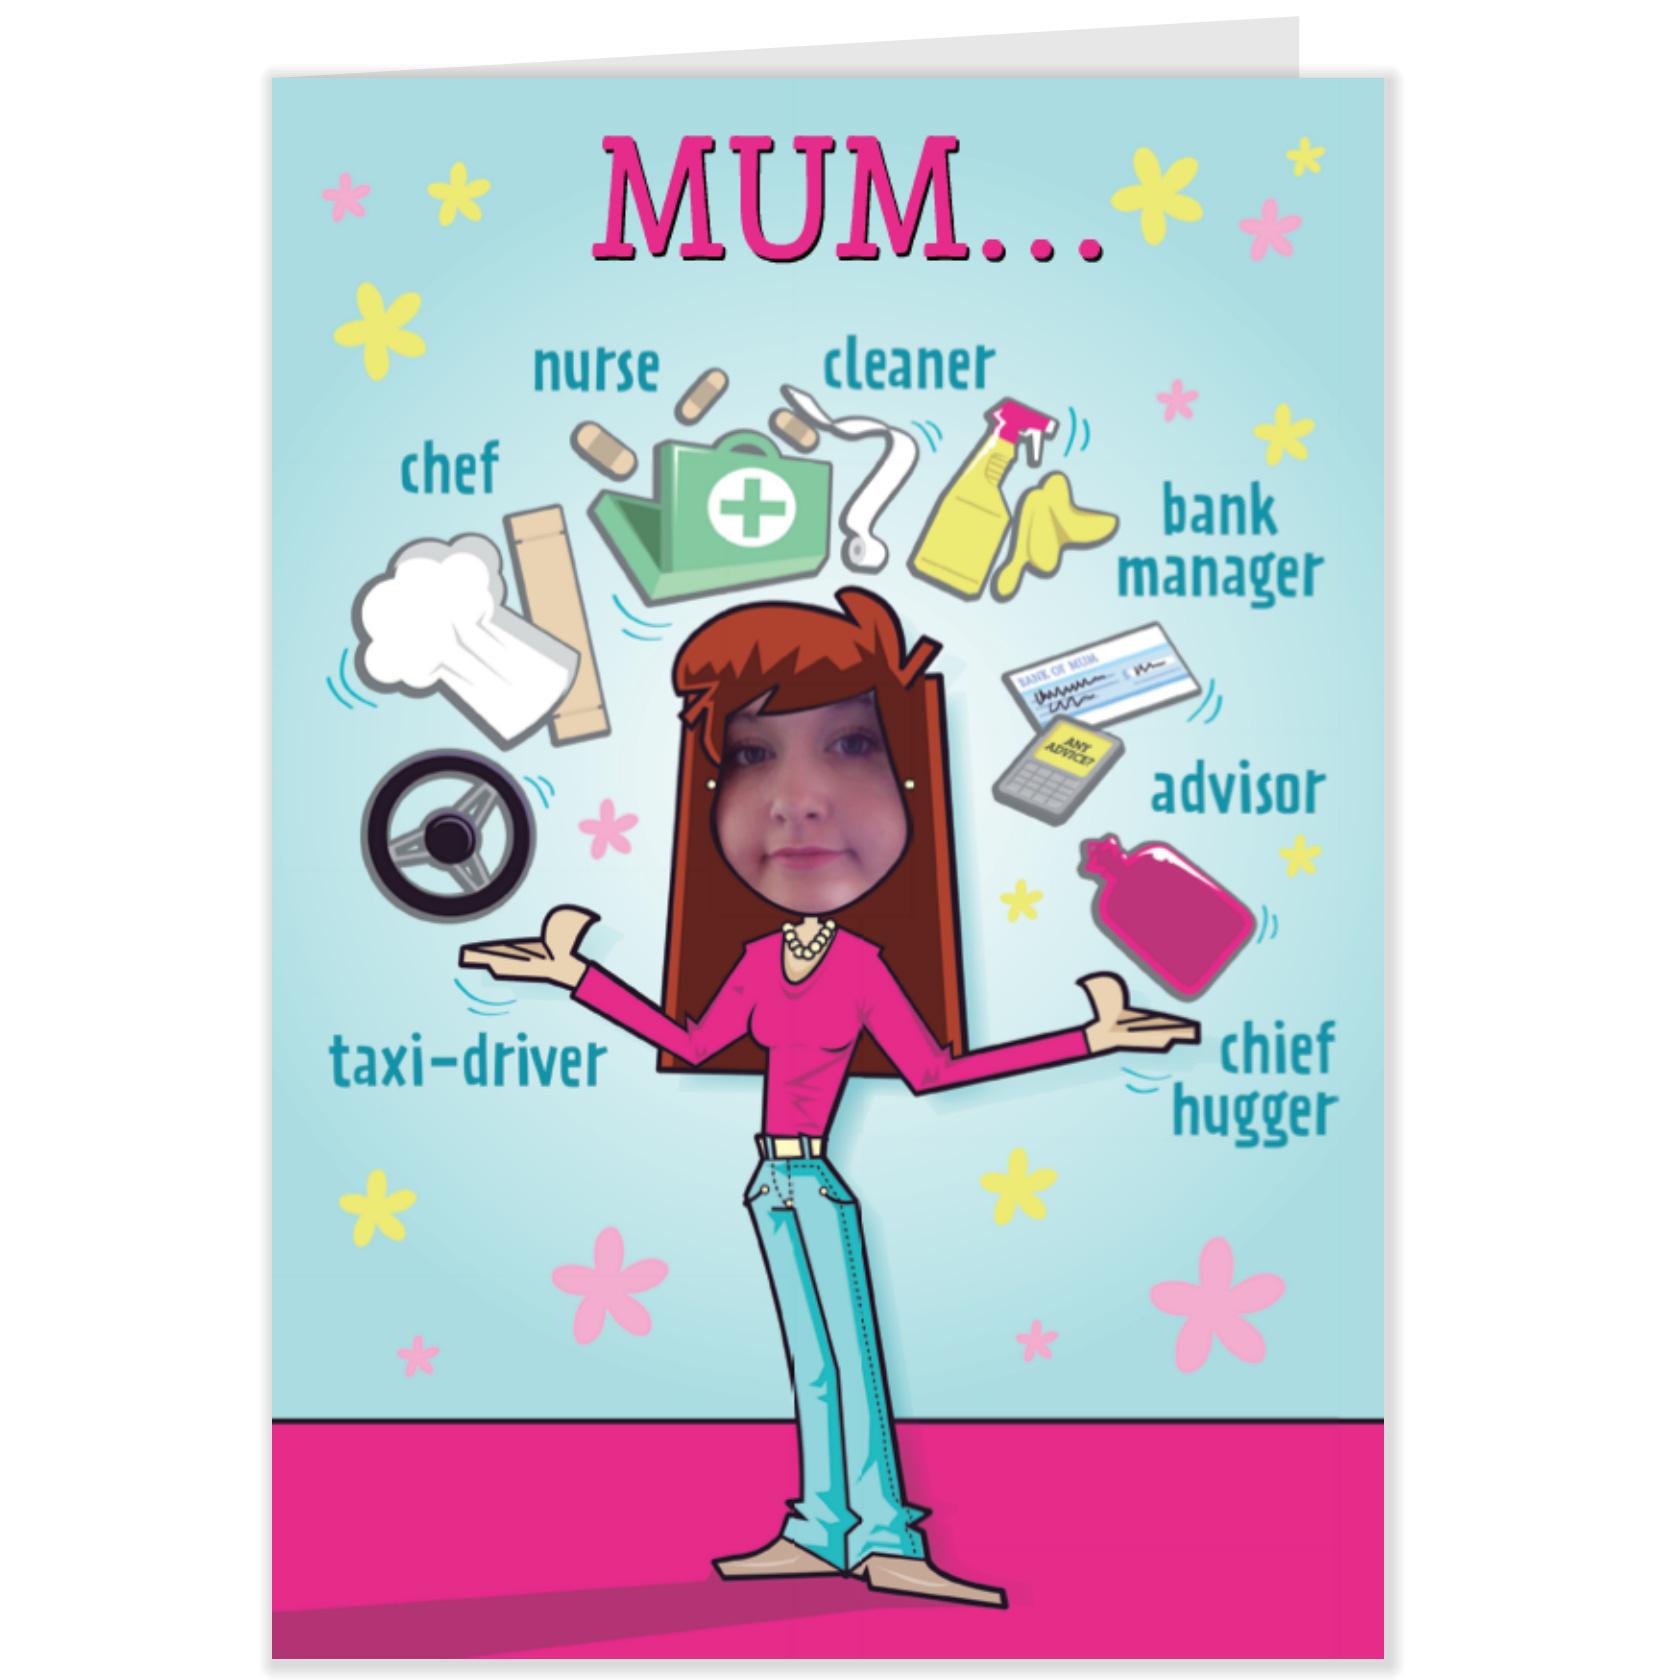 Printable Birthday Cards For Nurses | Download Them Or Print - Free Printable Birthday Cards For Mom